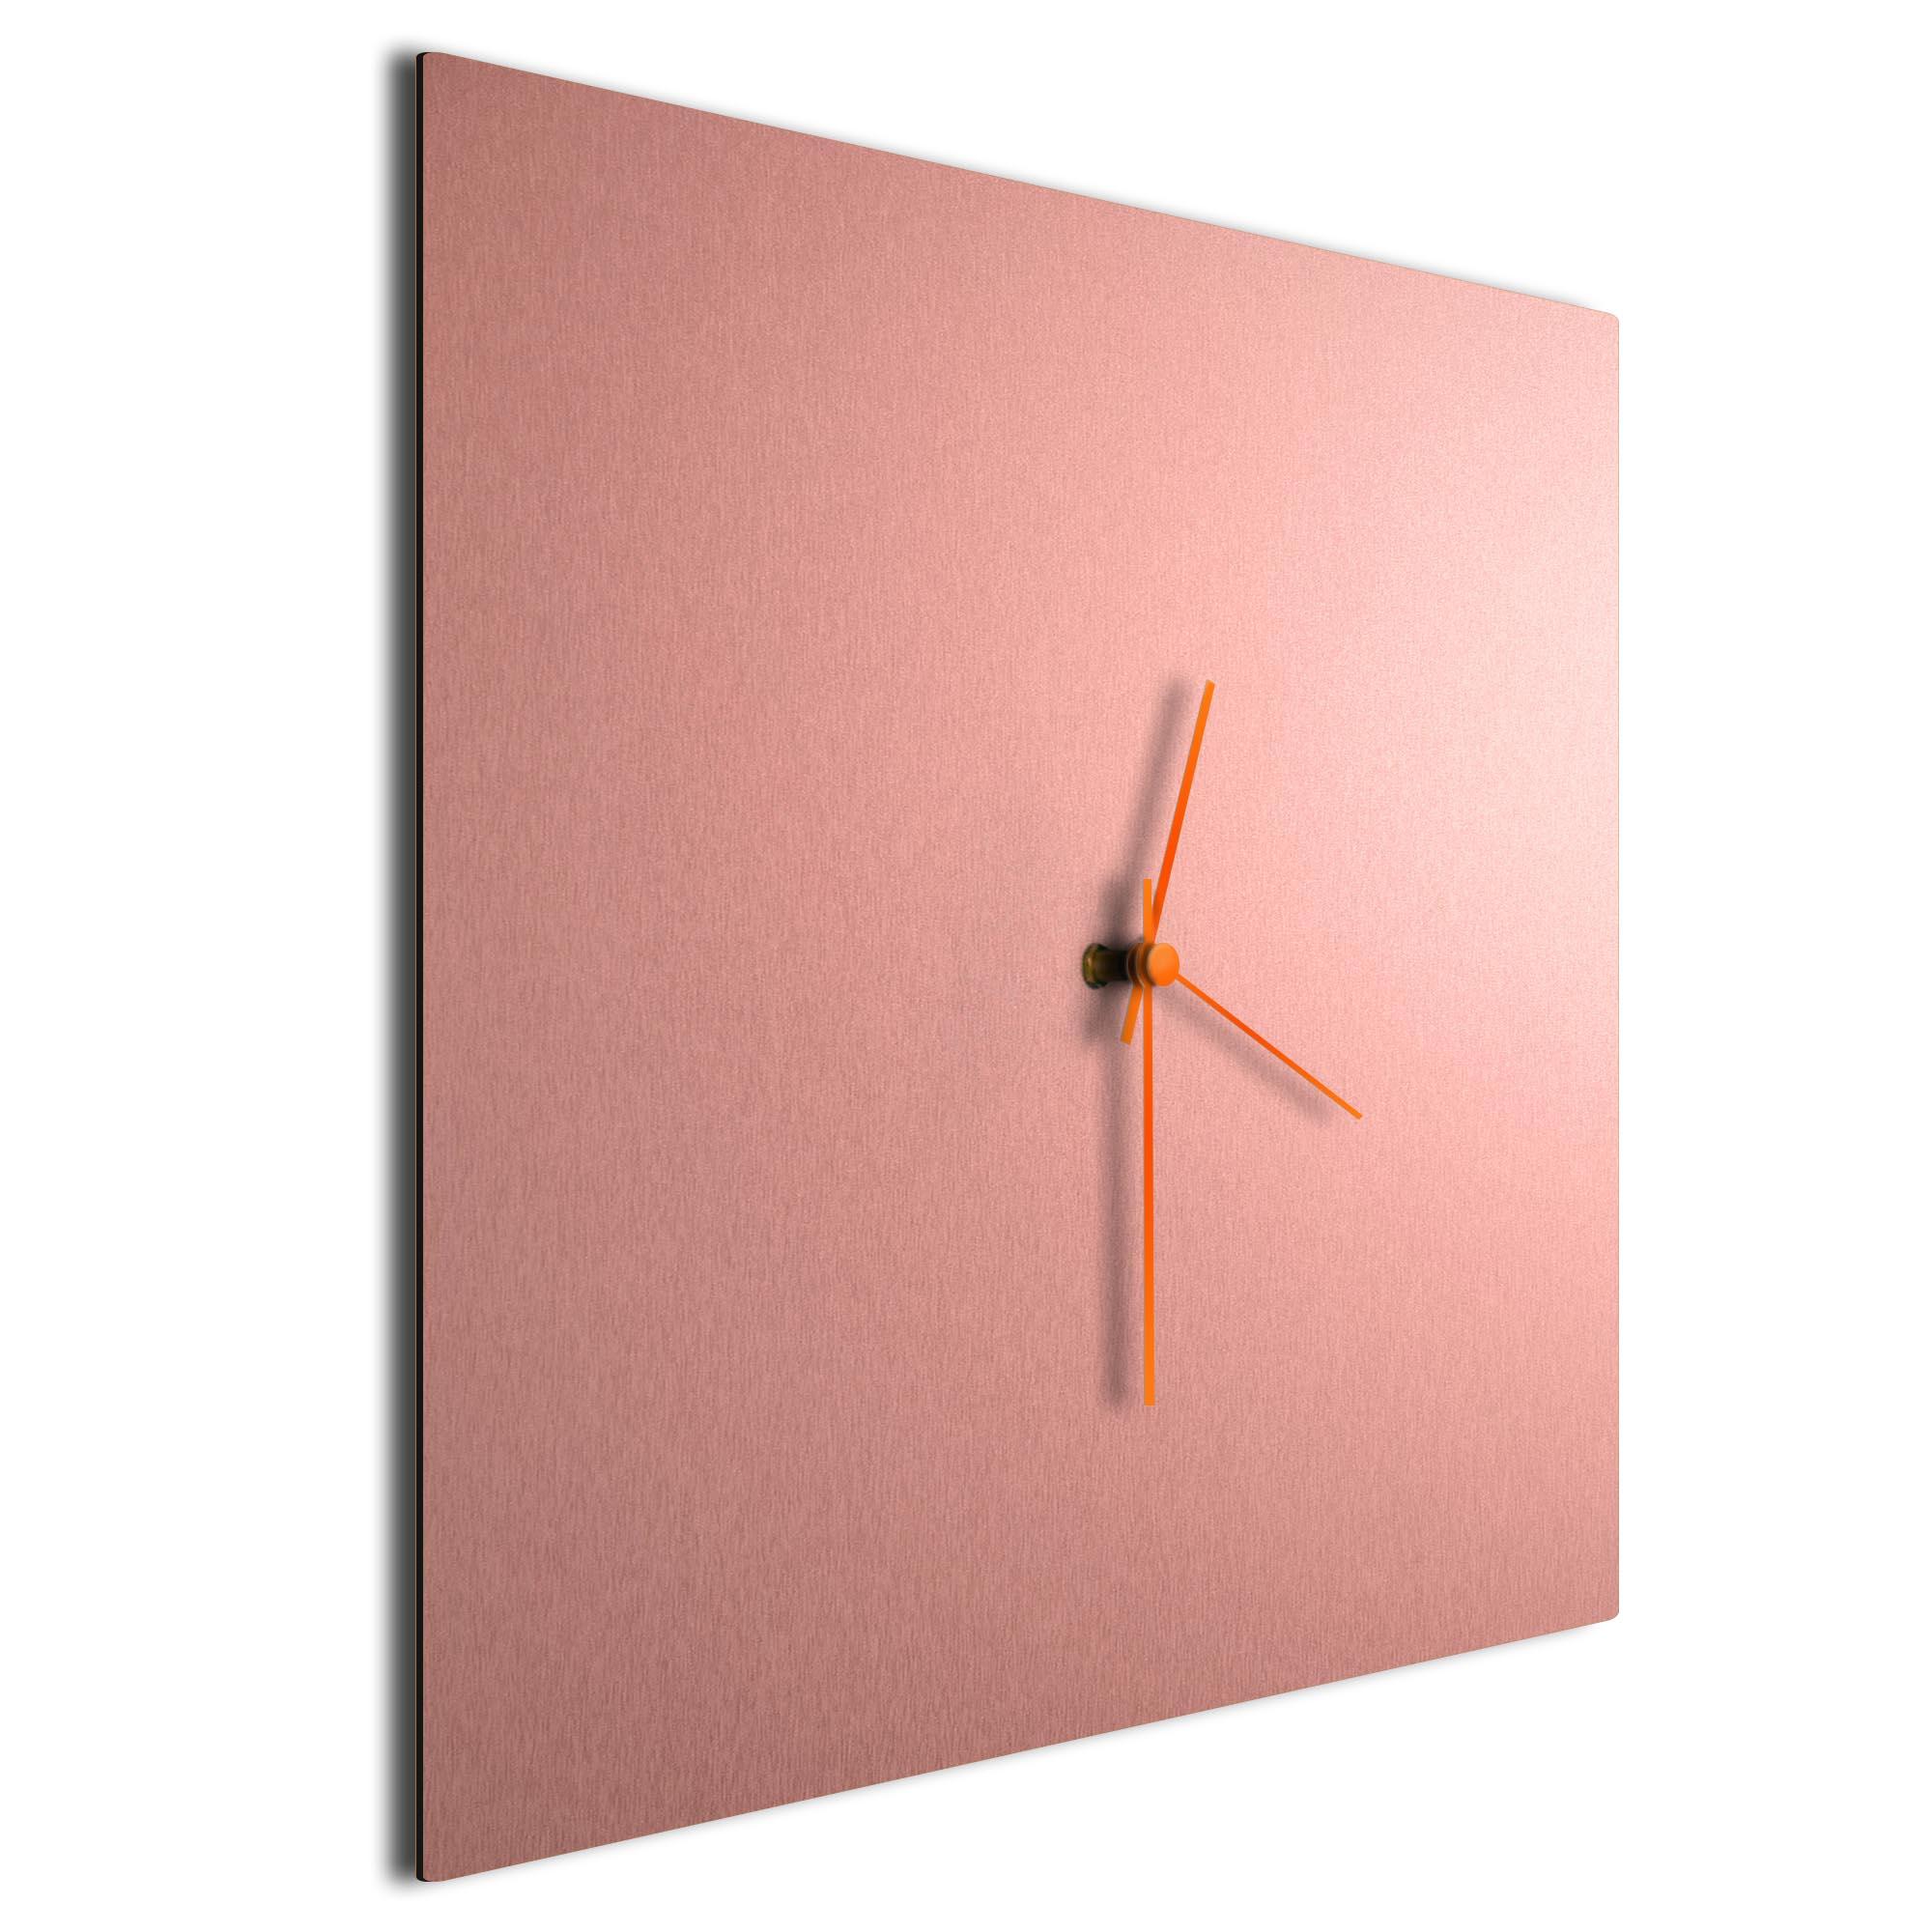 Coppersmith Square Clock Large Orange - Image 2